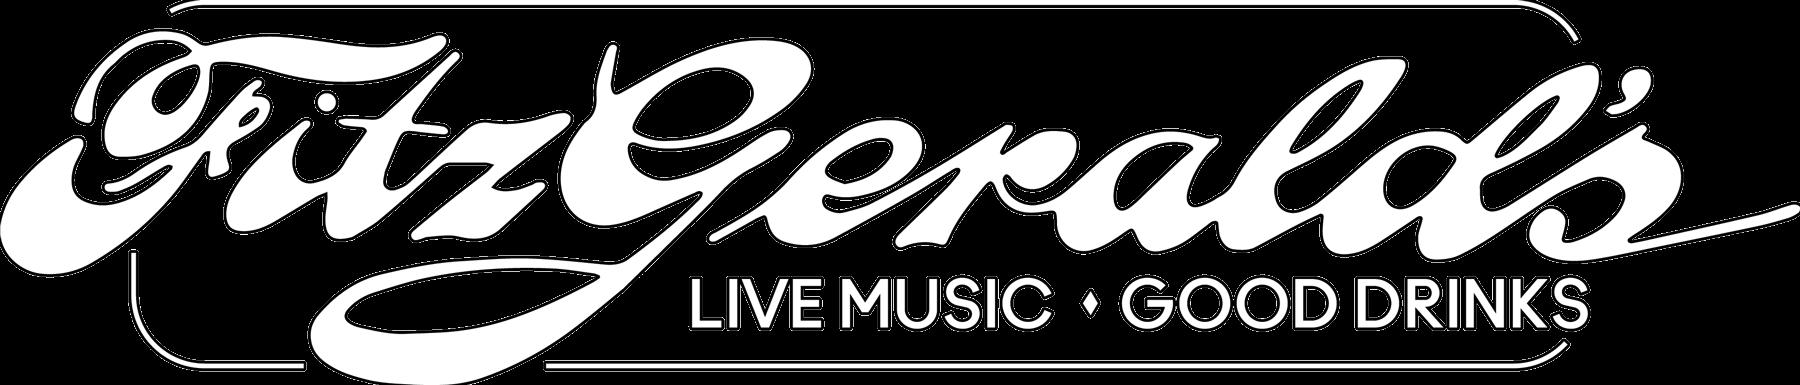 fitzgeralds logo